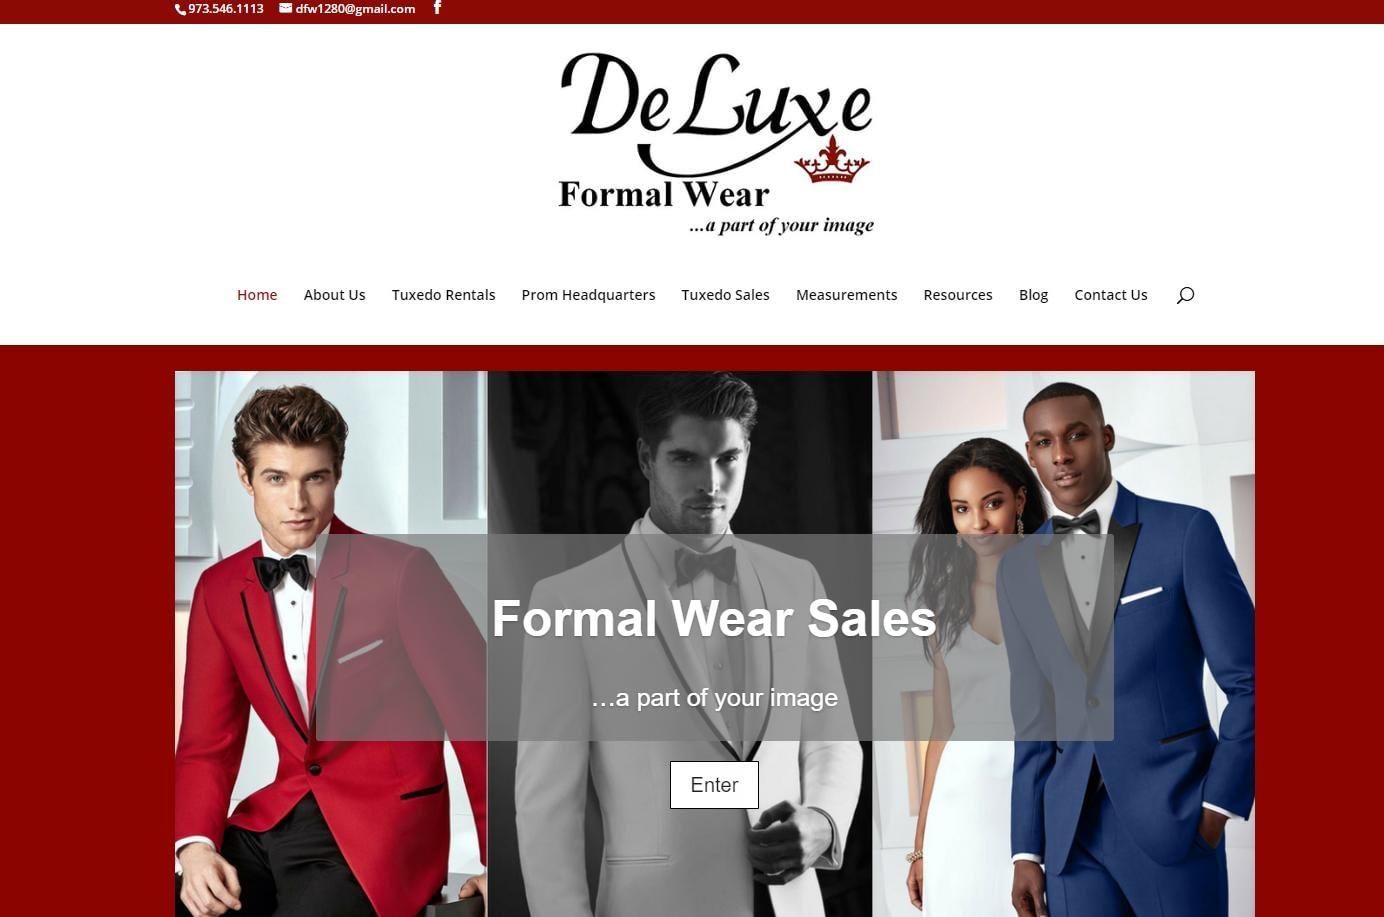 website designers NJ